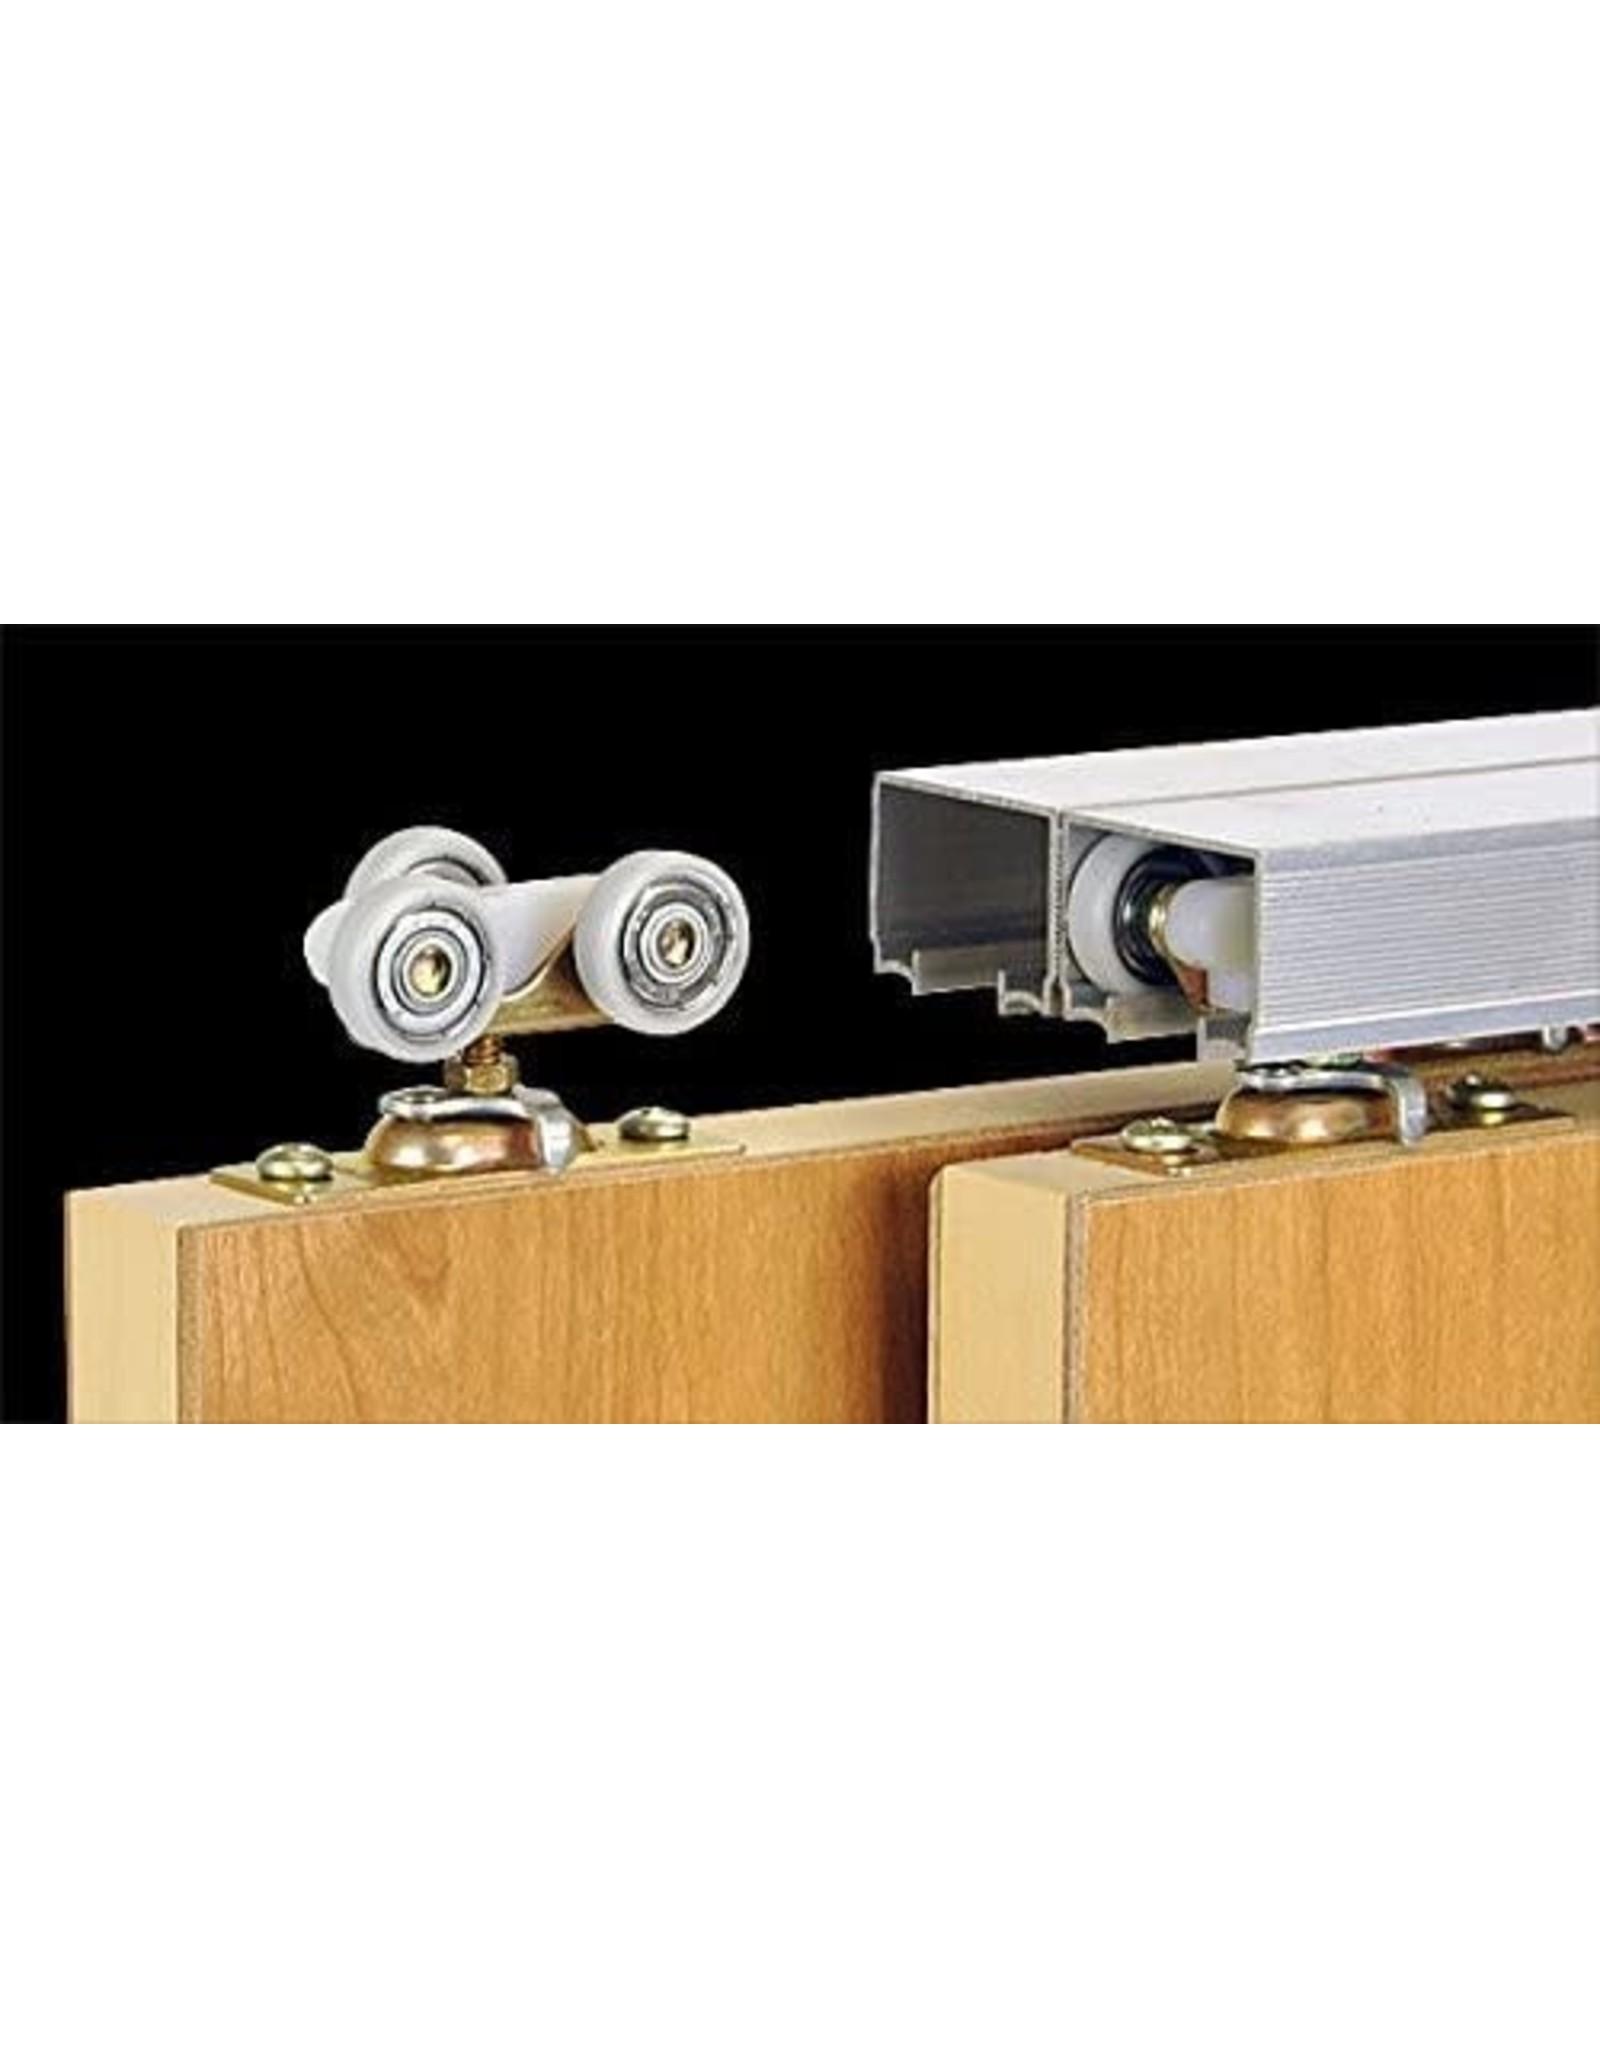 Johnson Hardware 100SD Sliding Bypass Door Hardware (96 In. Length 2 Door System)